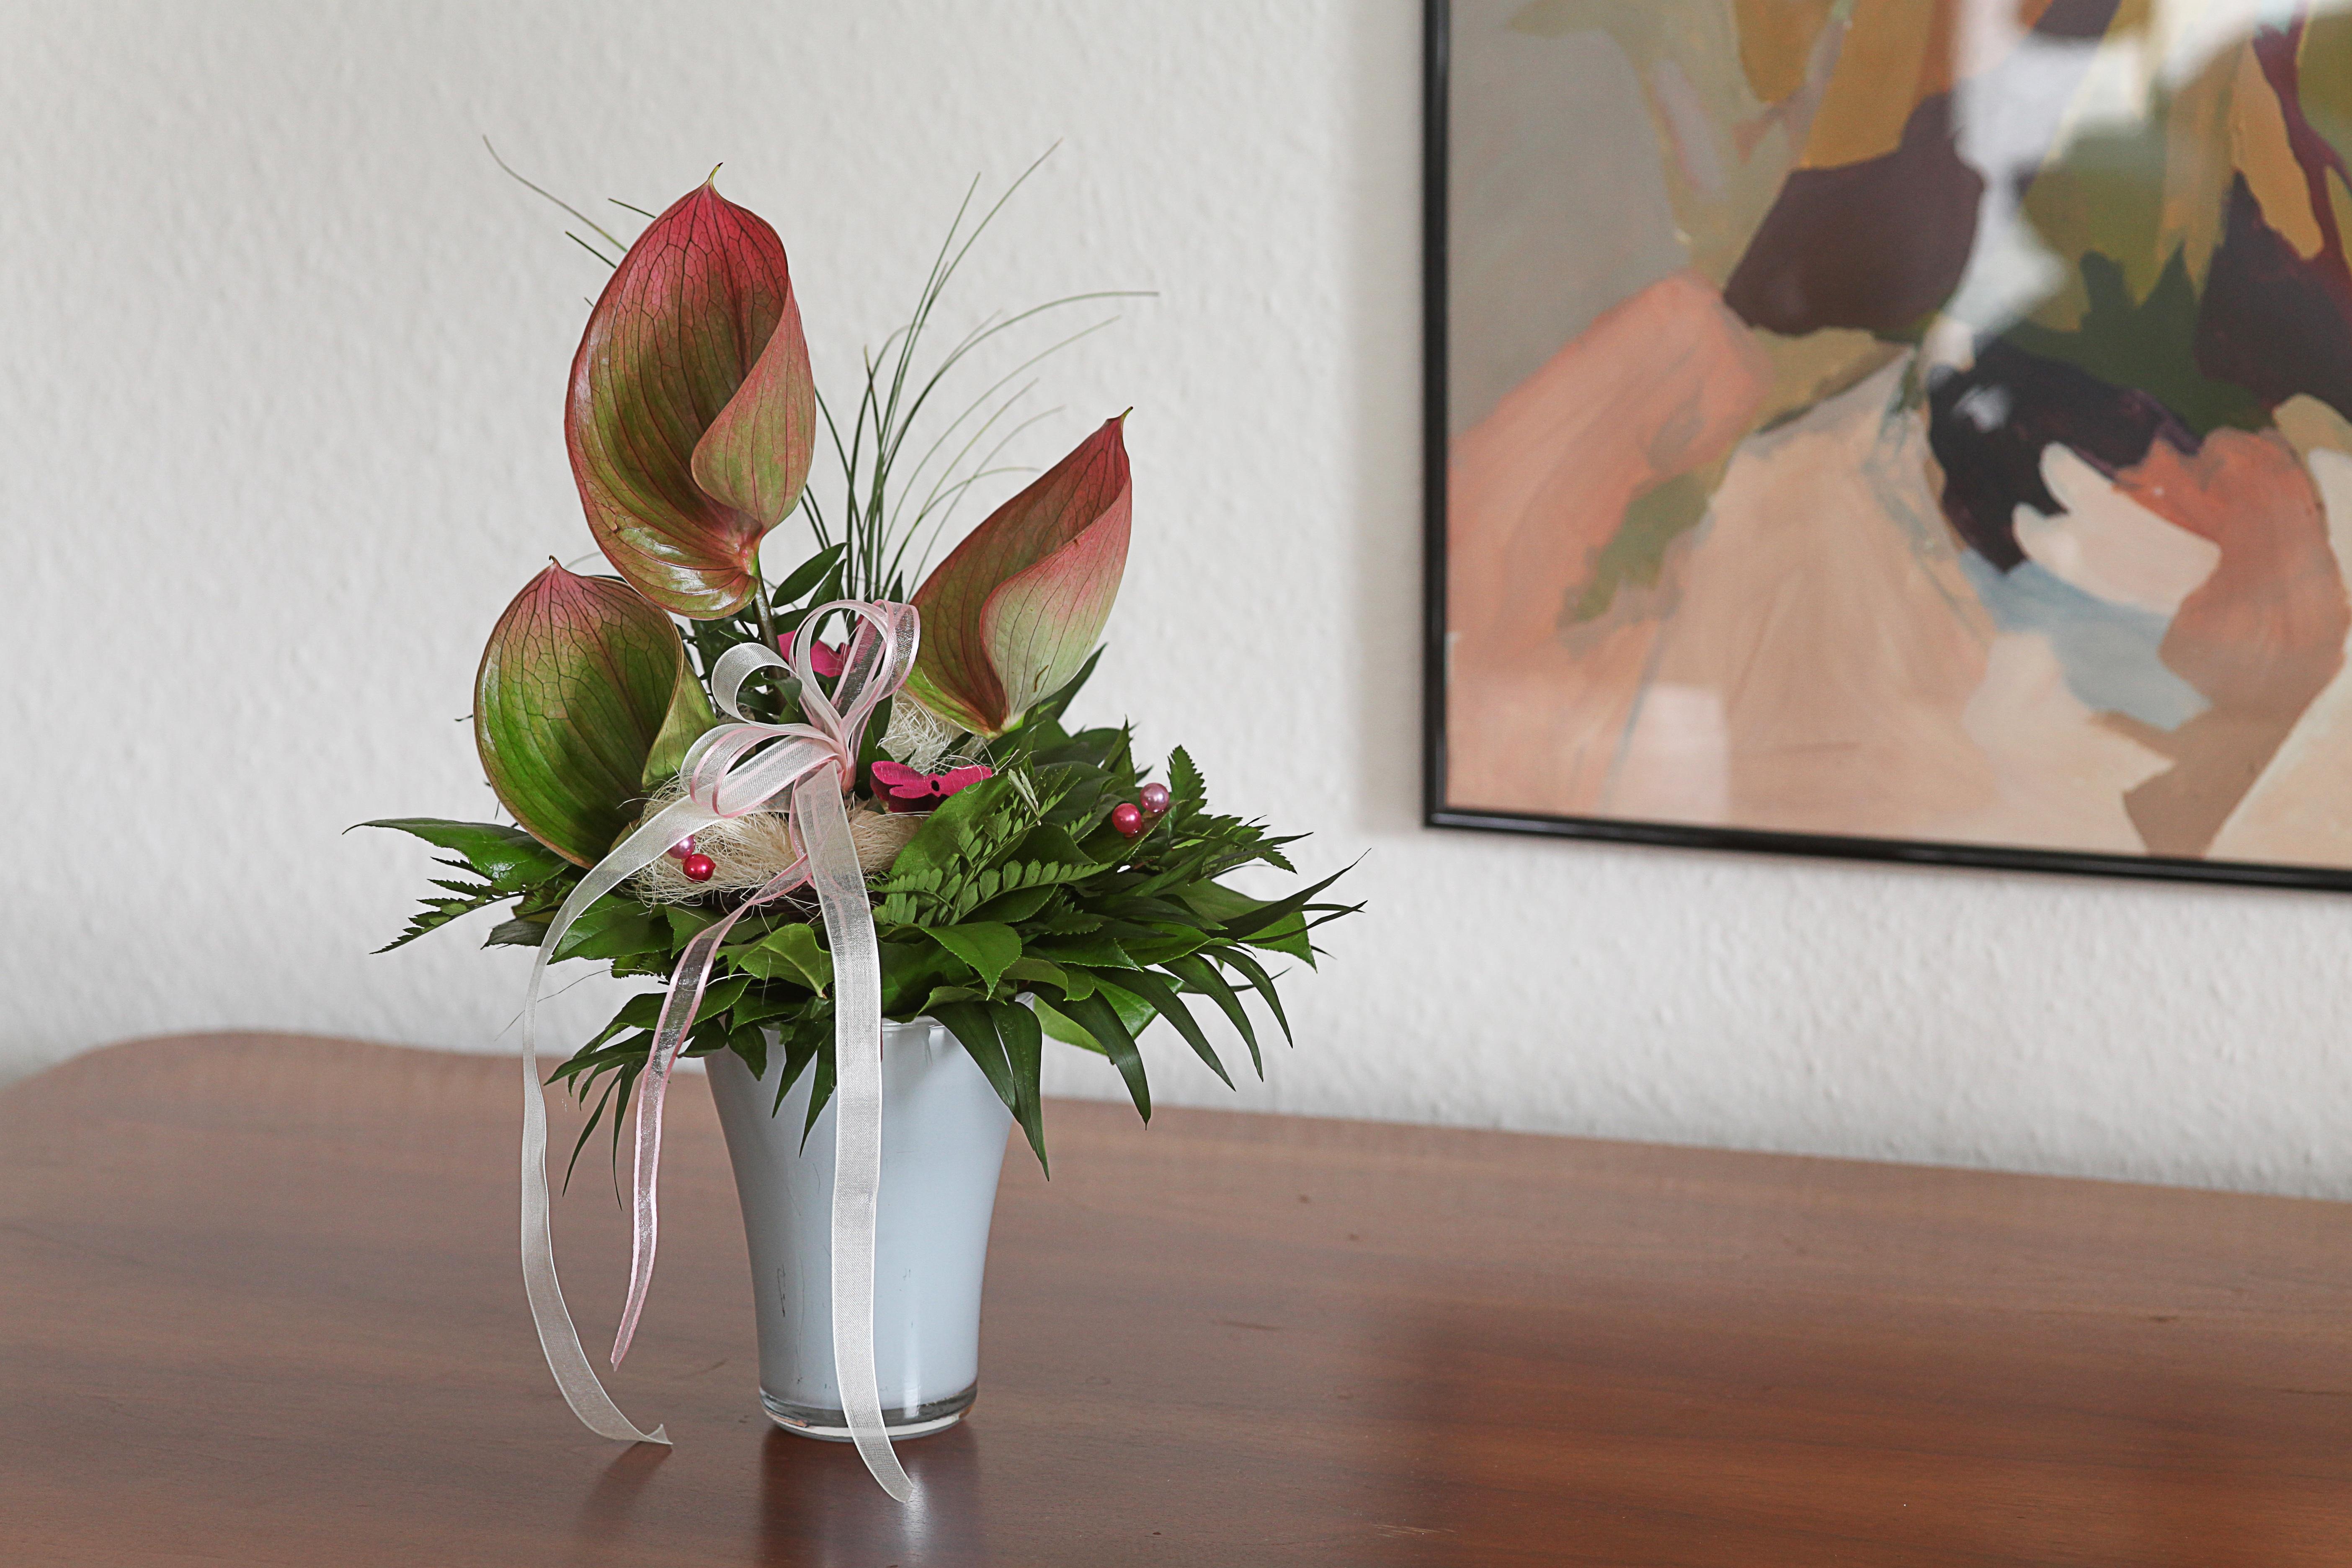 Free Images Plant White Interior Rose Decoration